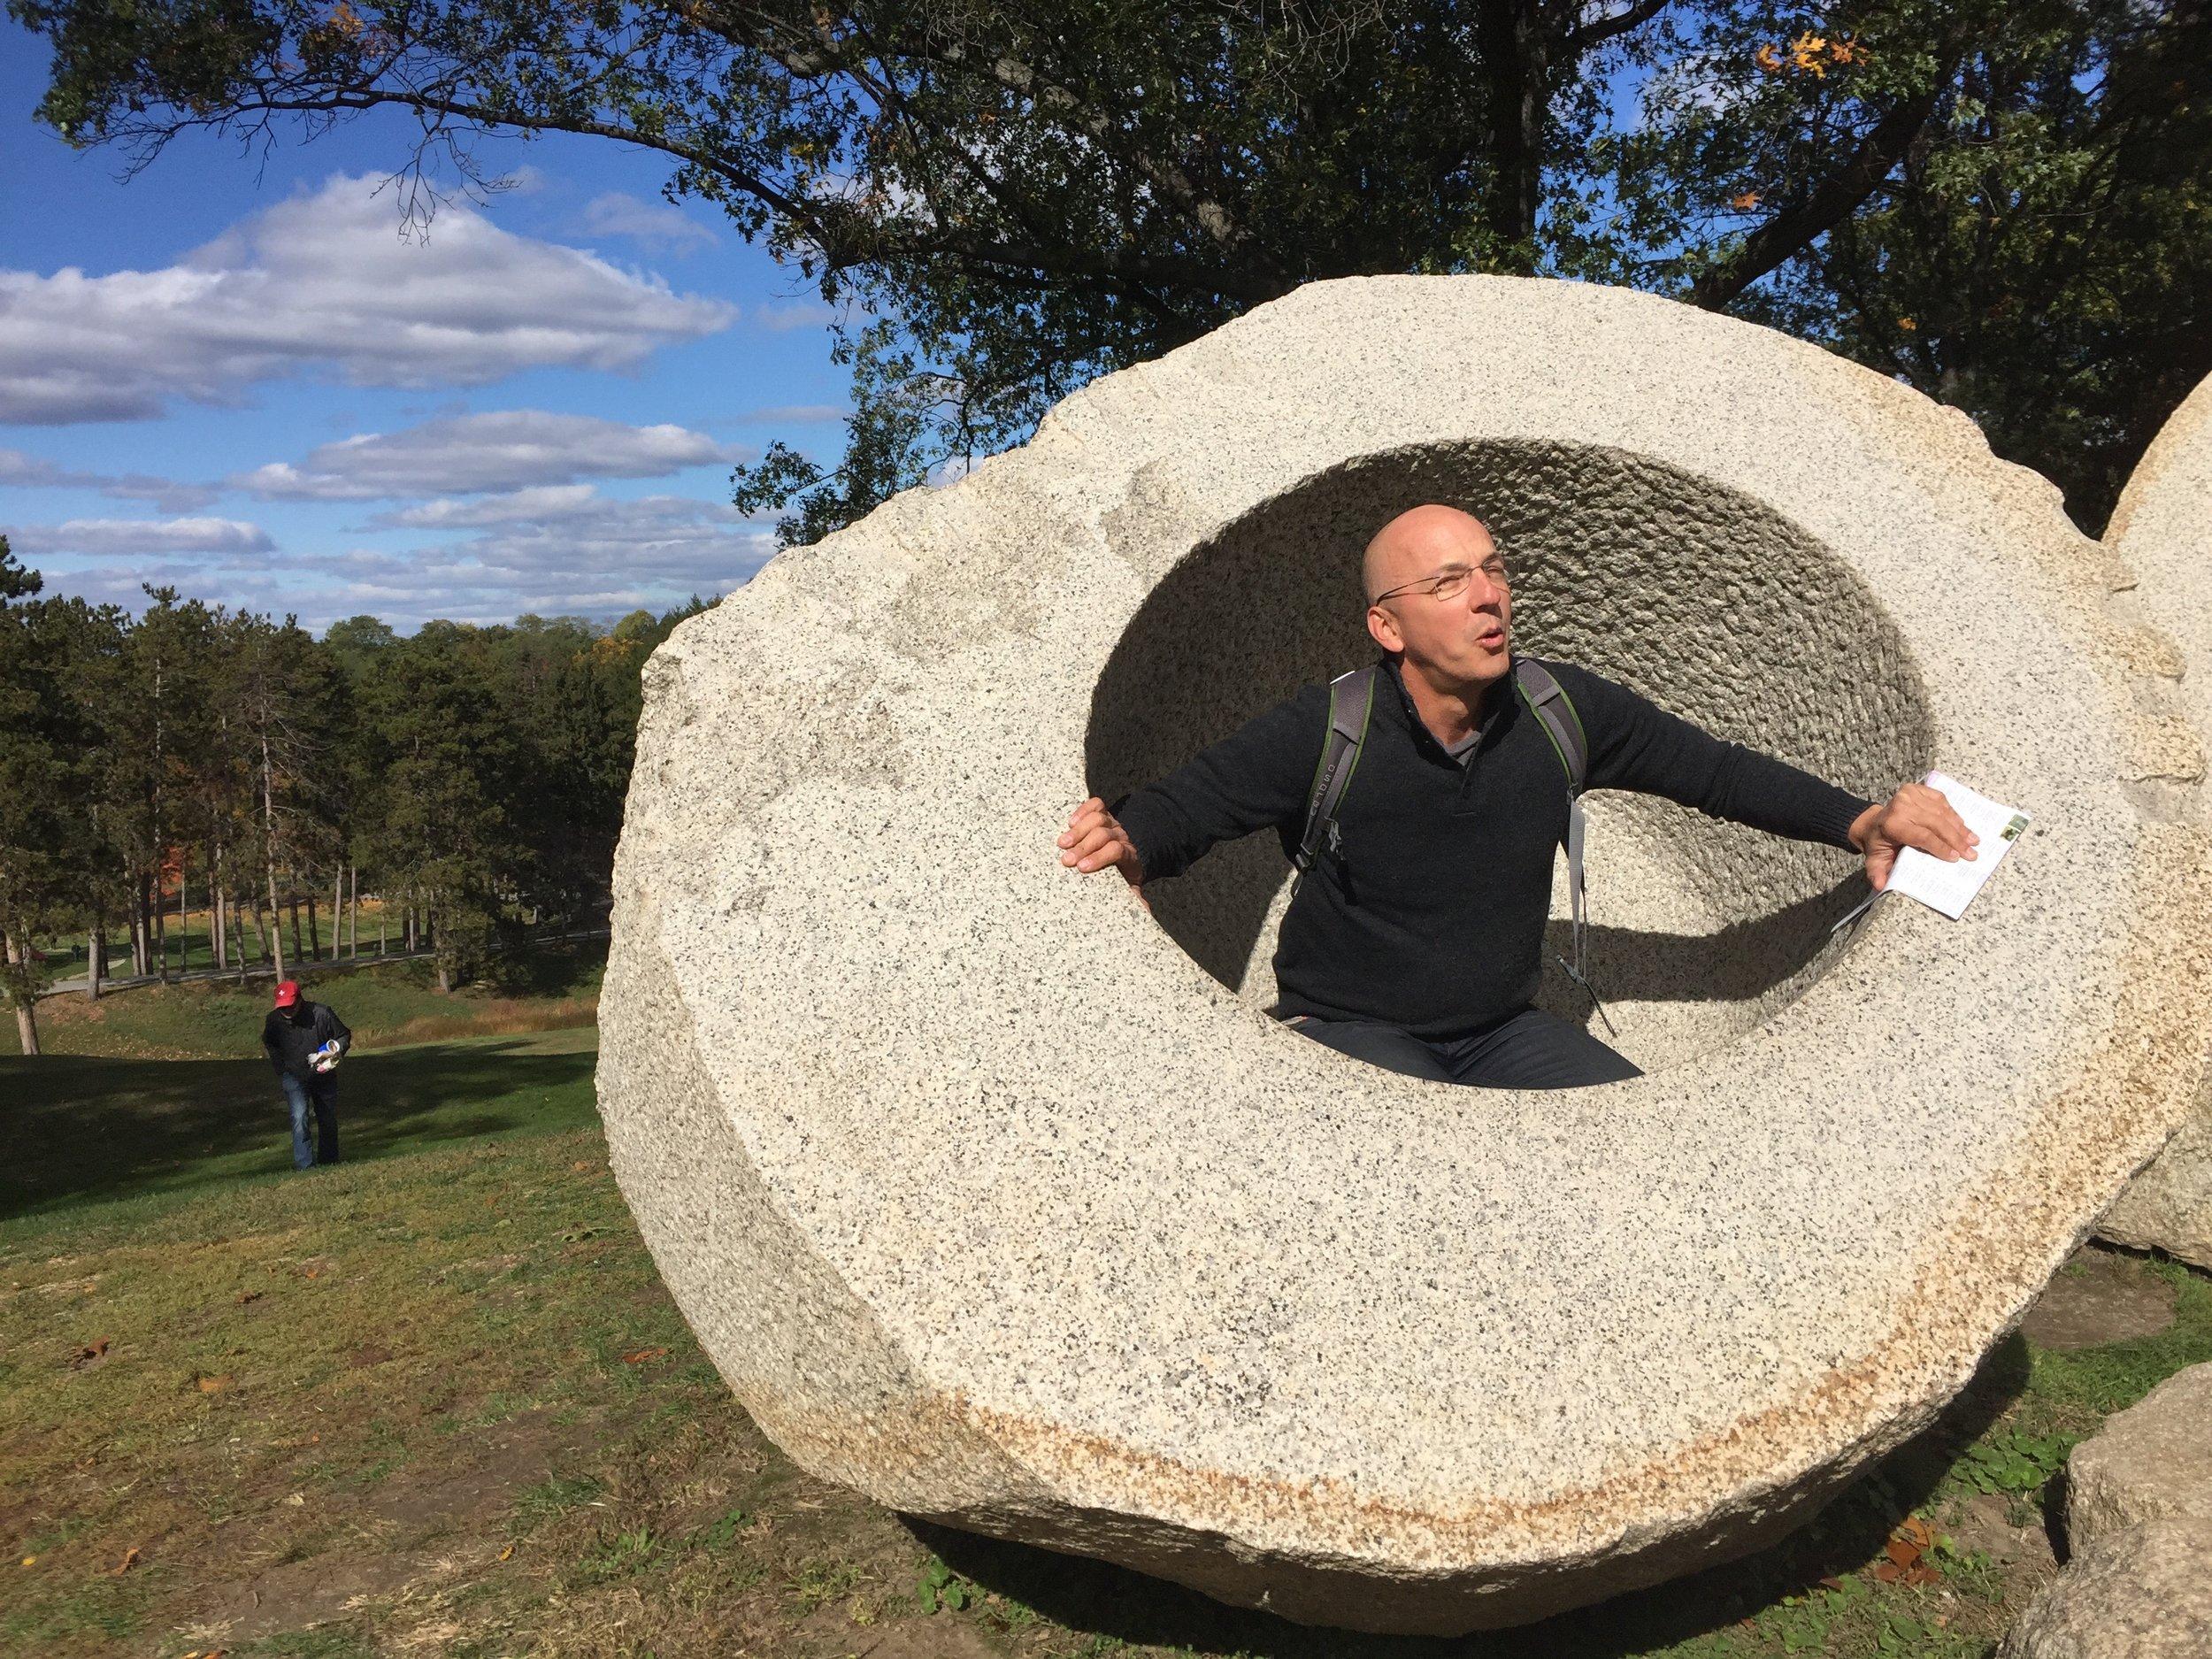 Sculpture in upstate New York